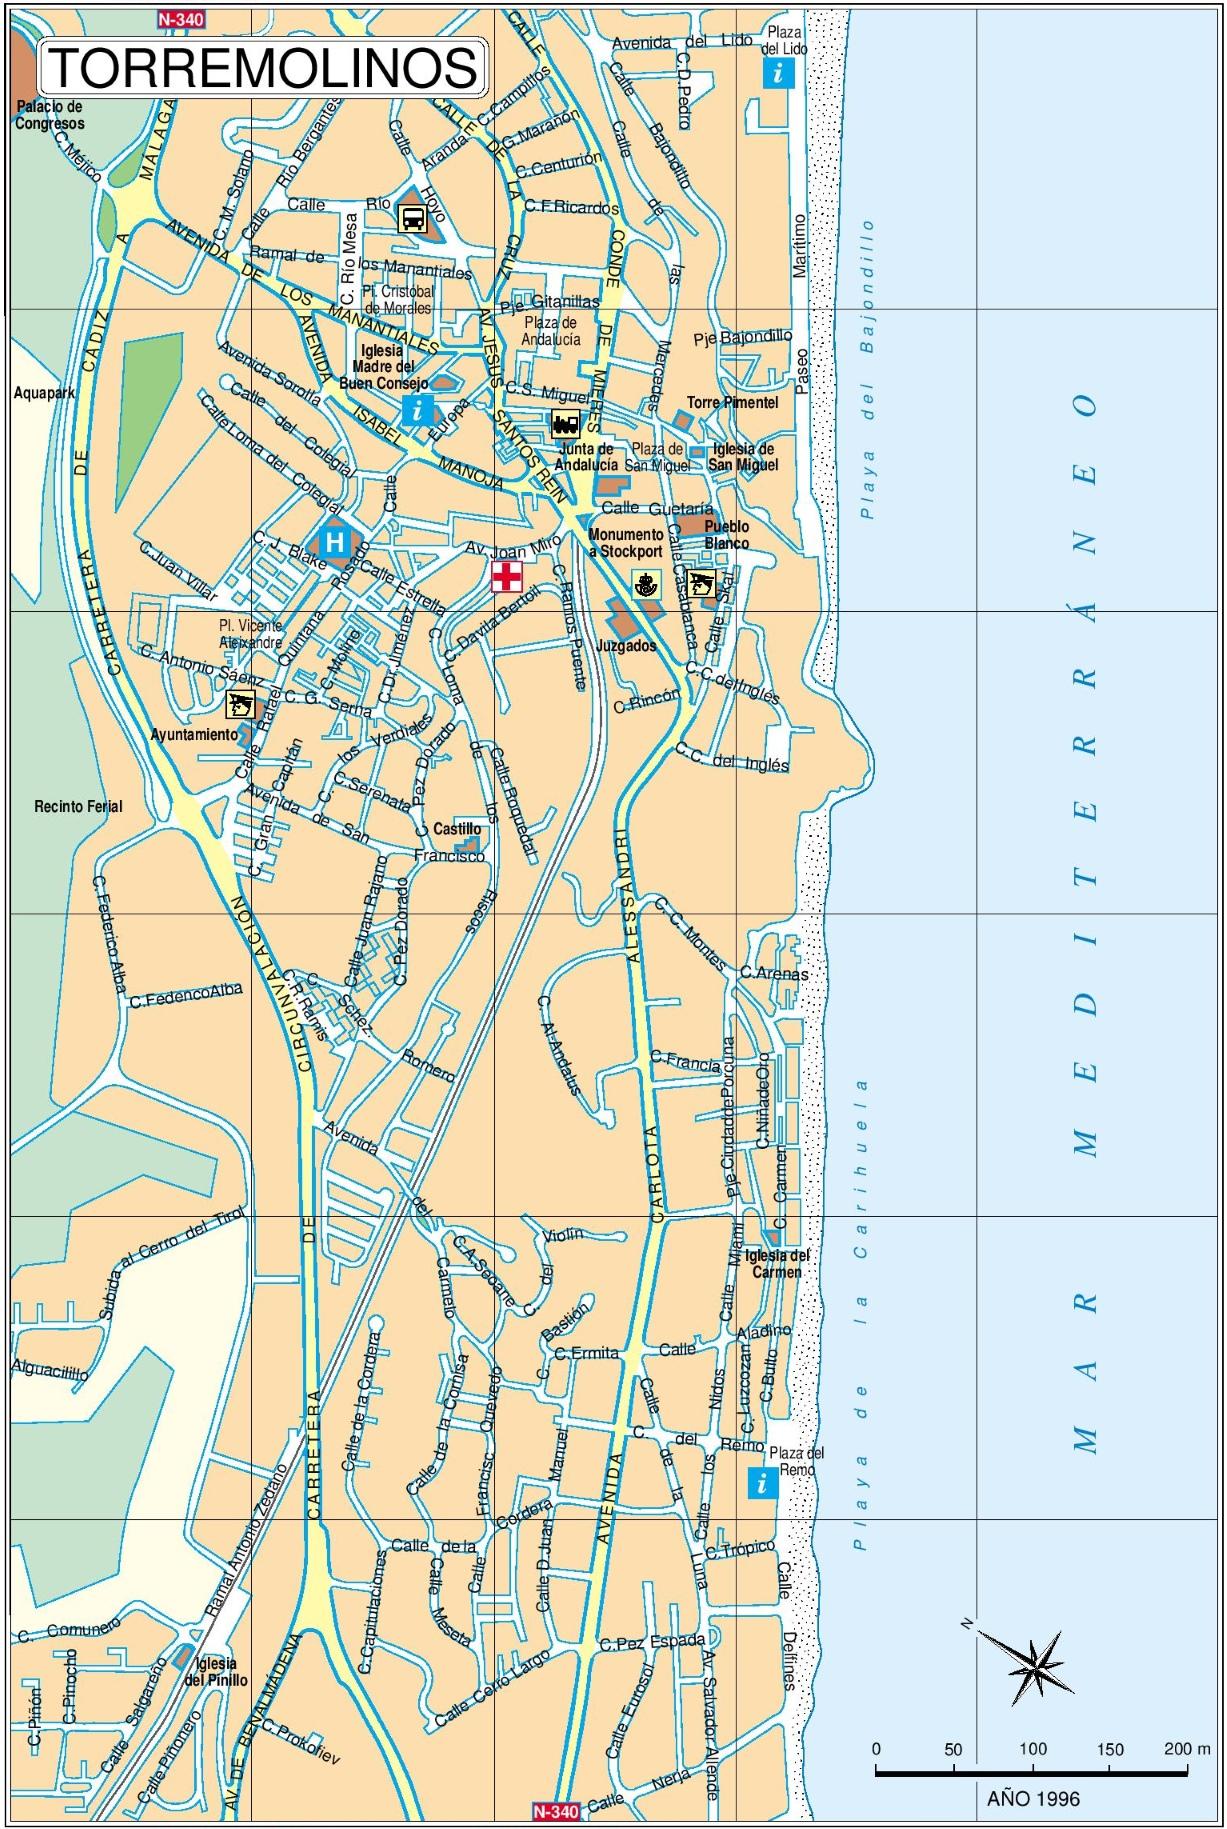 Torremolinos tourist map